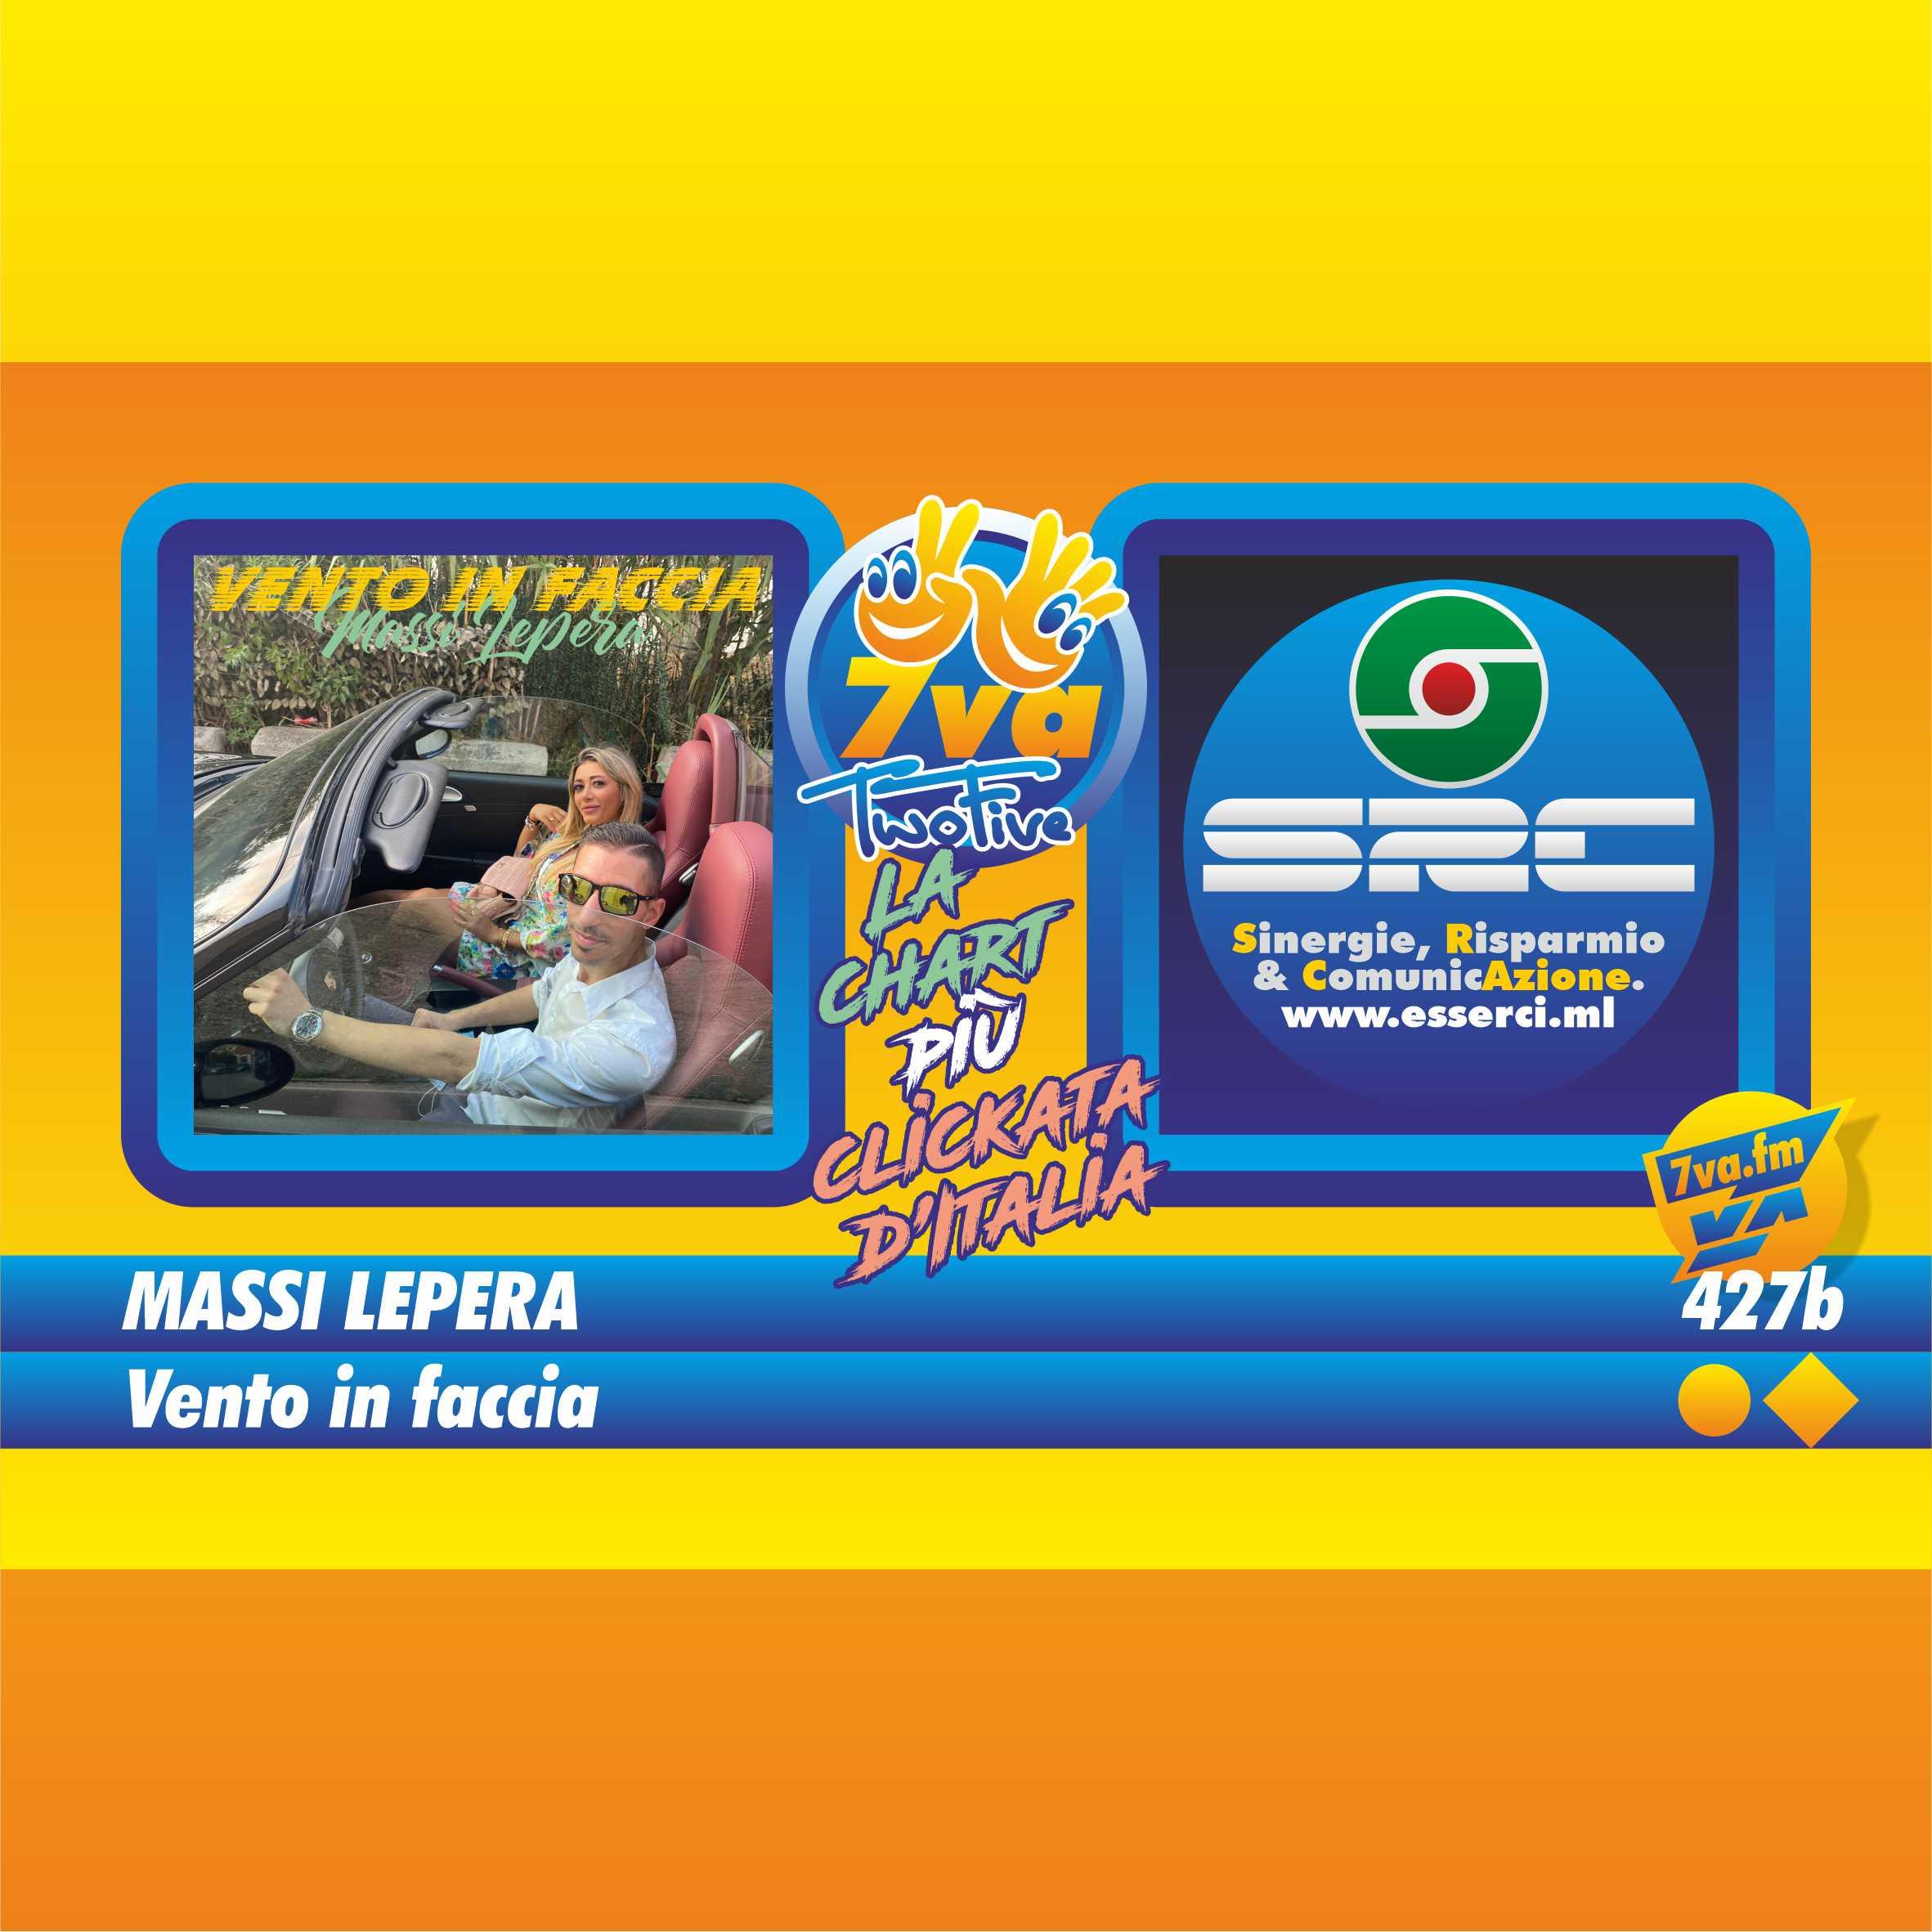 427b MASSI LEPERA - Vento in faccia - in TwoFive